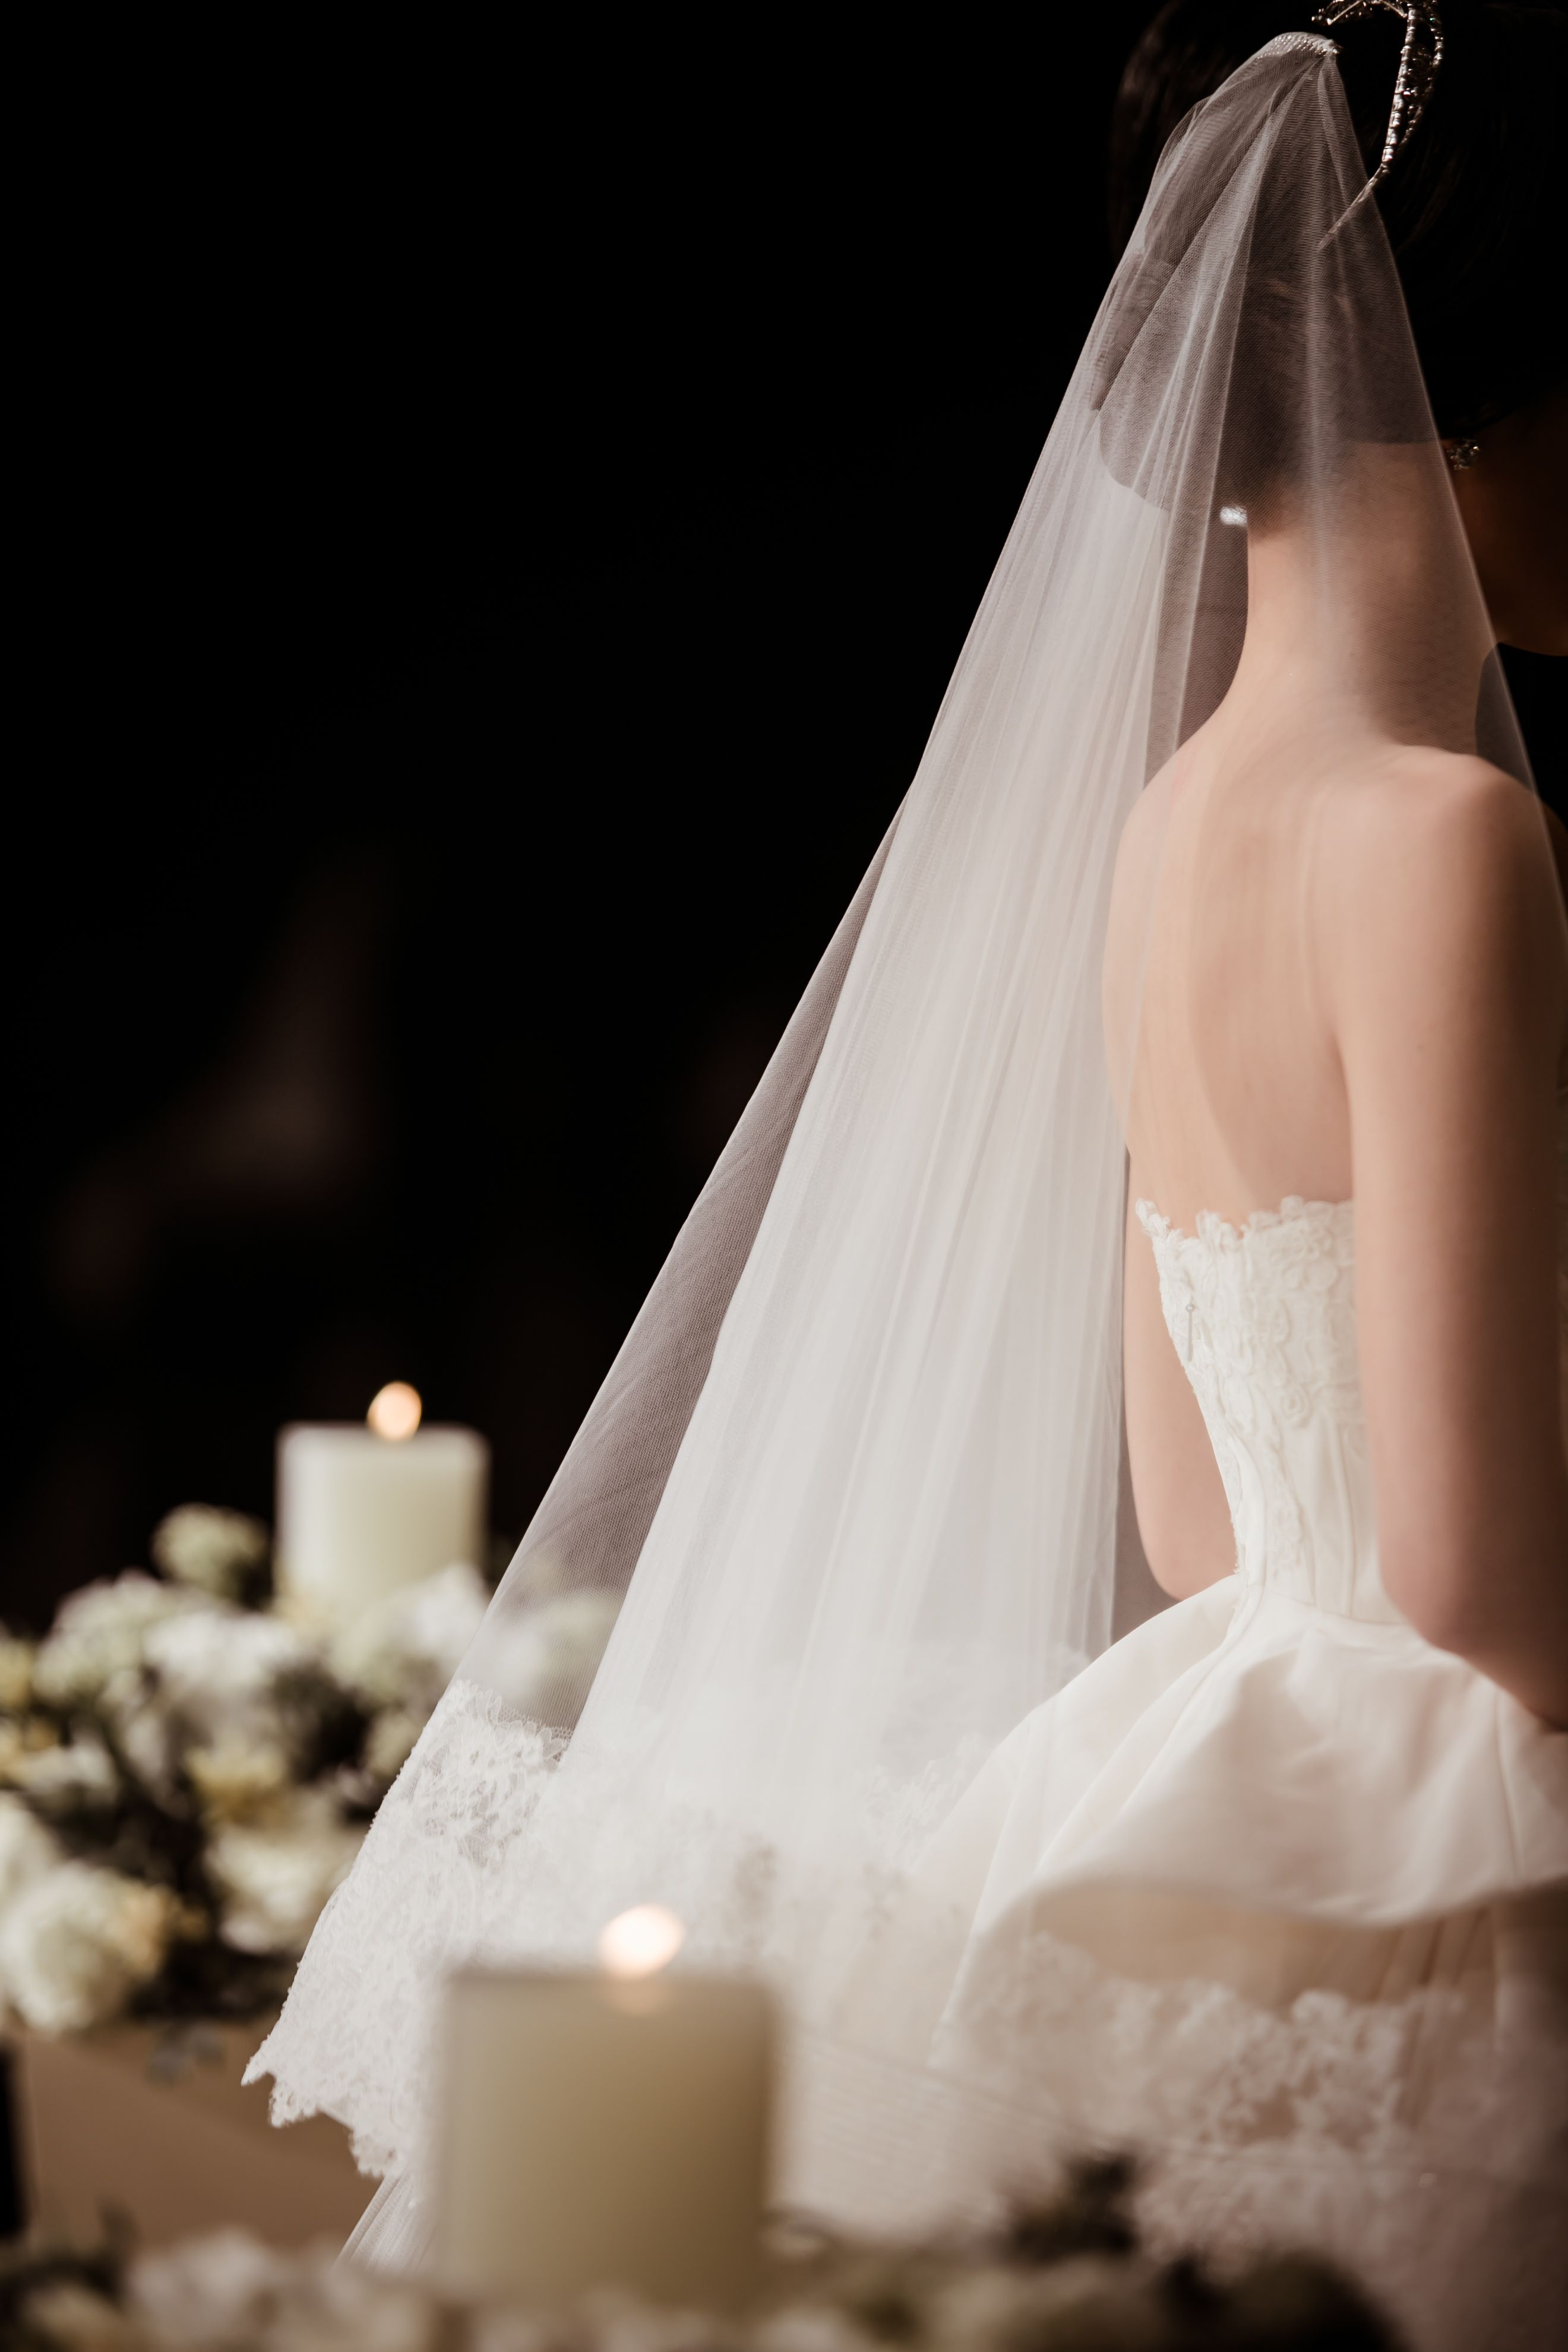 The bride wore oscar de la renta for her wedding in seoul korea